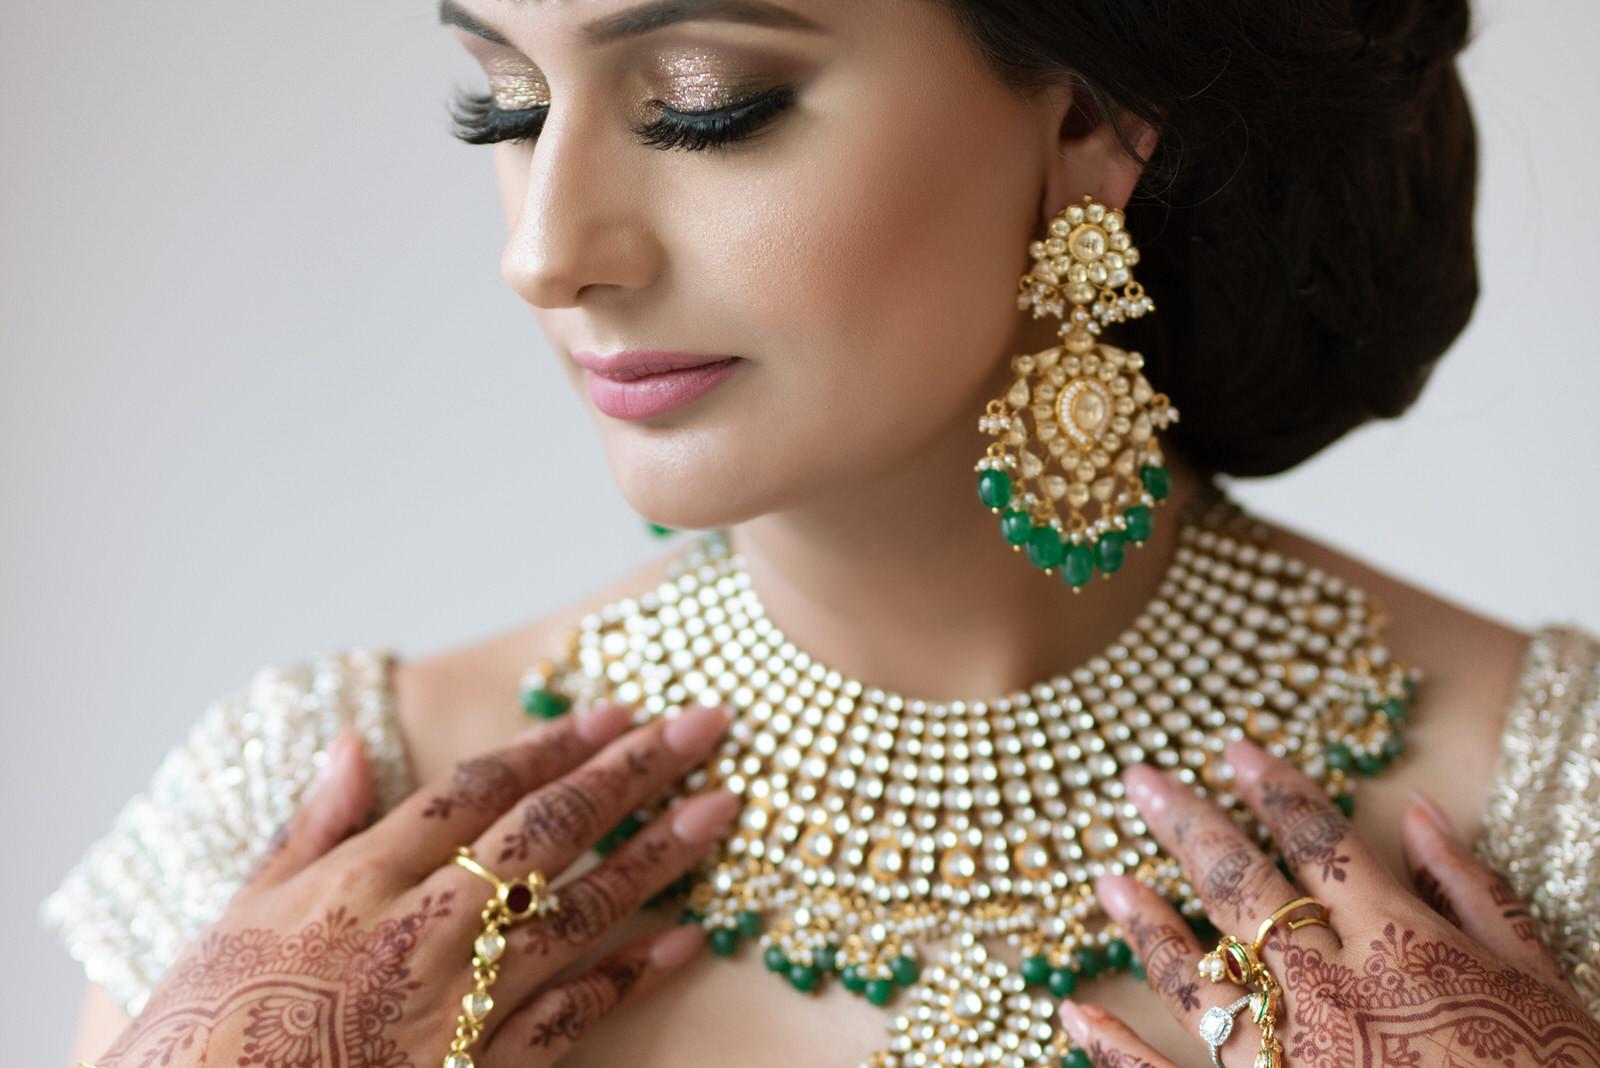 Bride-Portrait-Wedding-Photography-Leicester-Close-up.jpeg